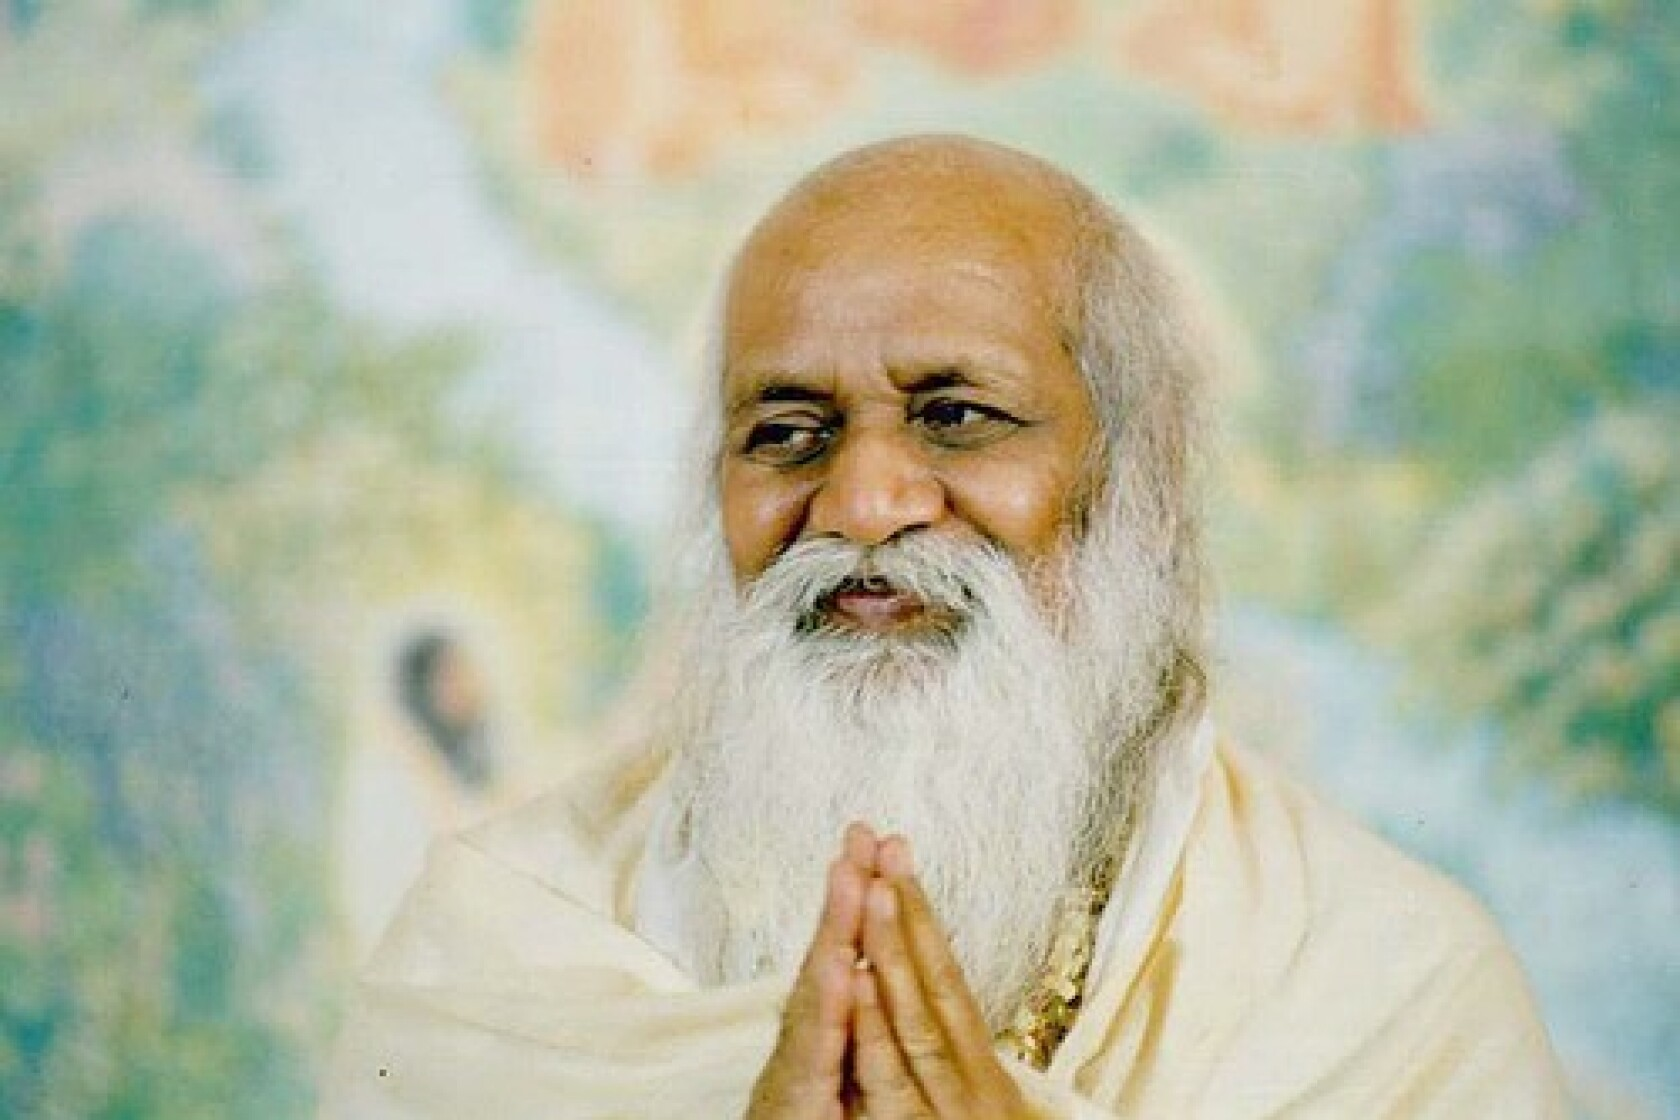 Maharishi Mahesh Yogi Founded Transcendental Meditation Movement Los Angeles Times